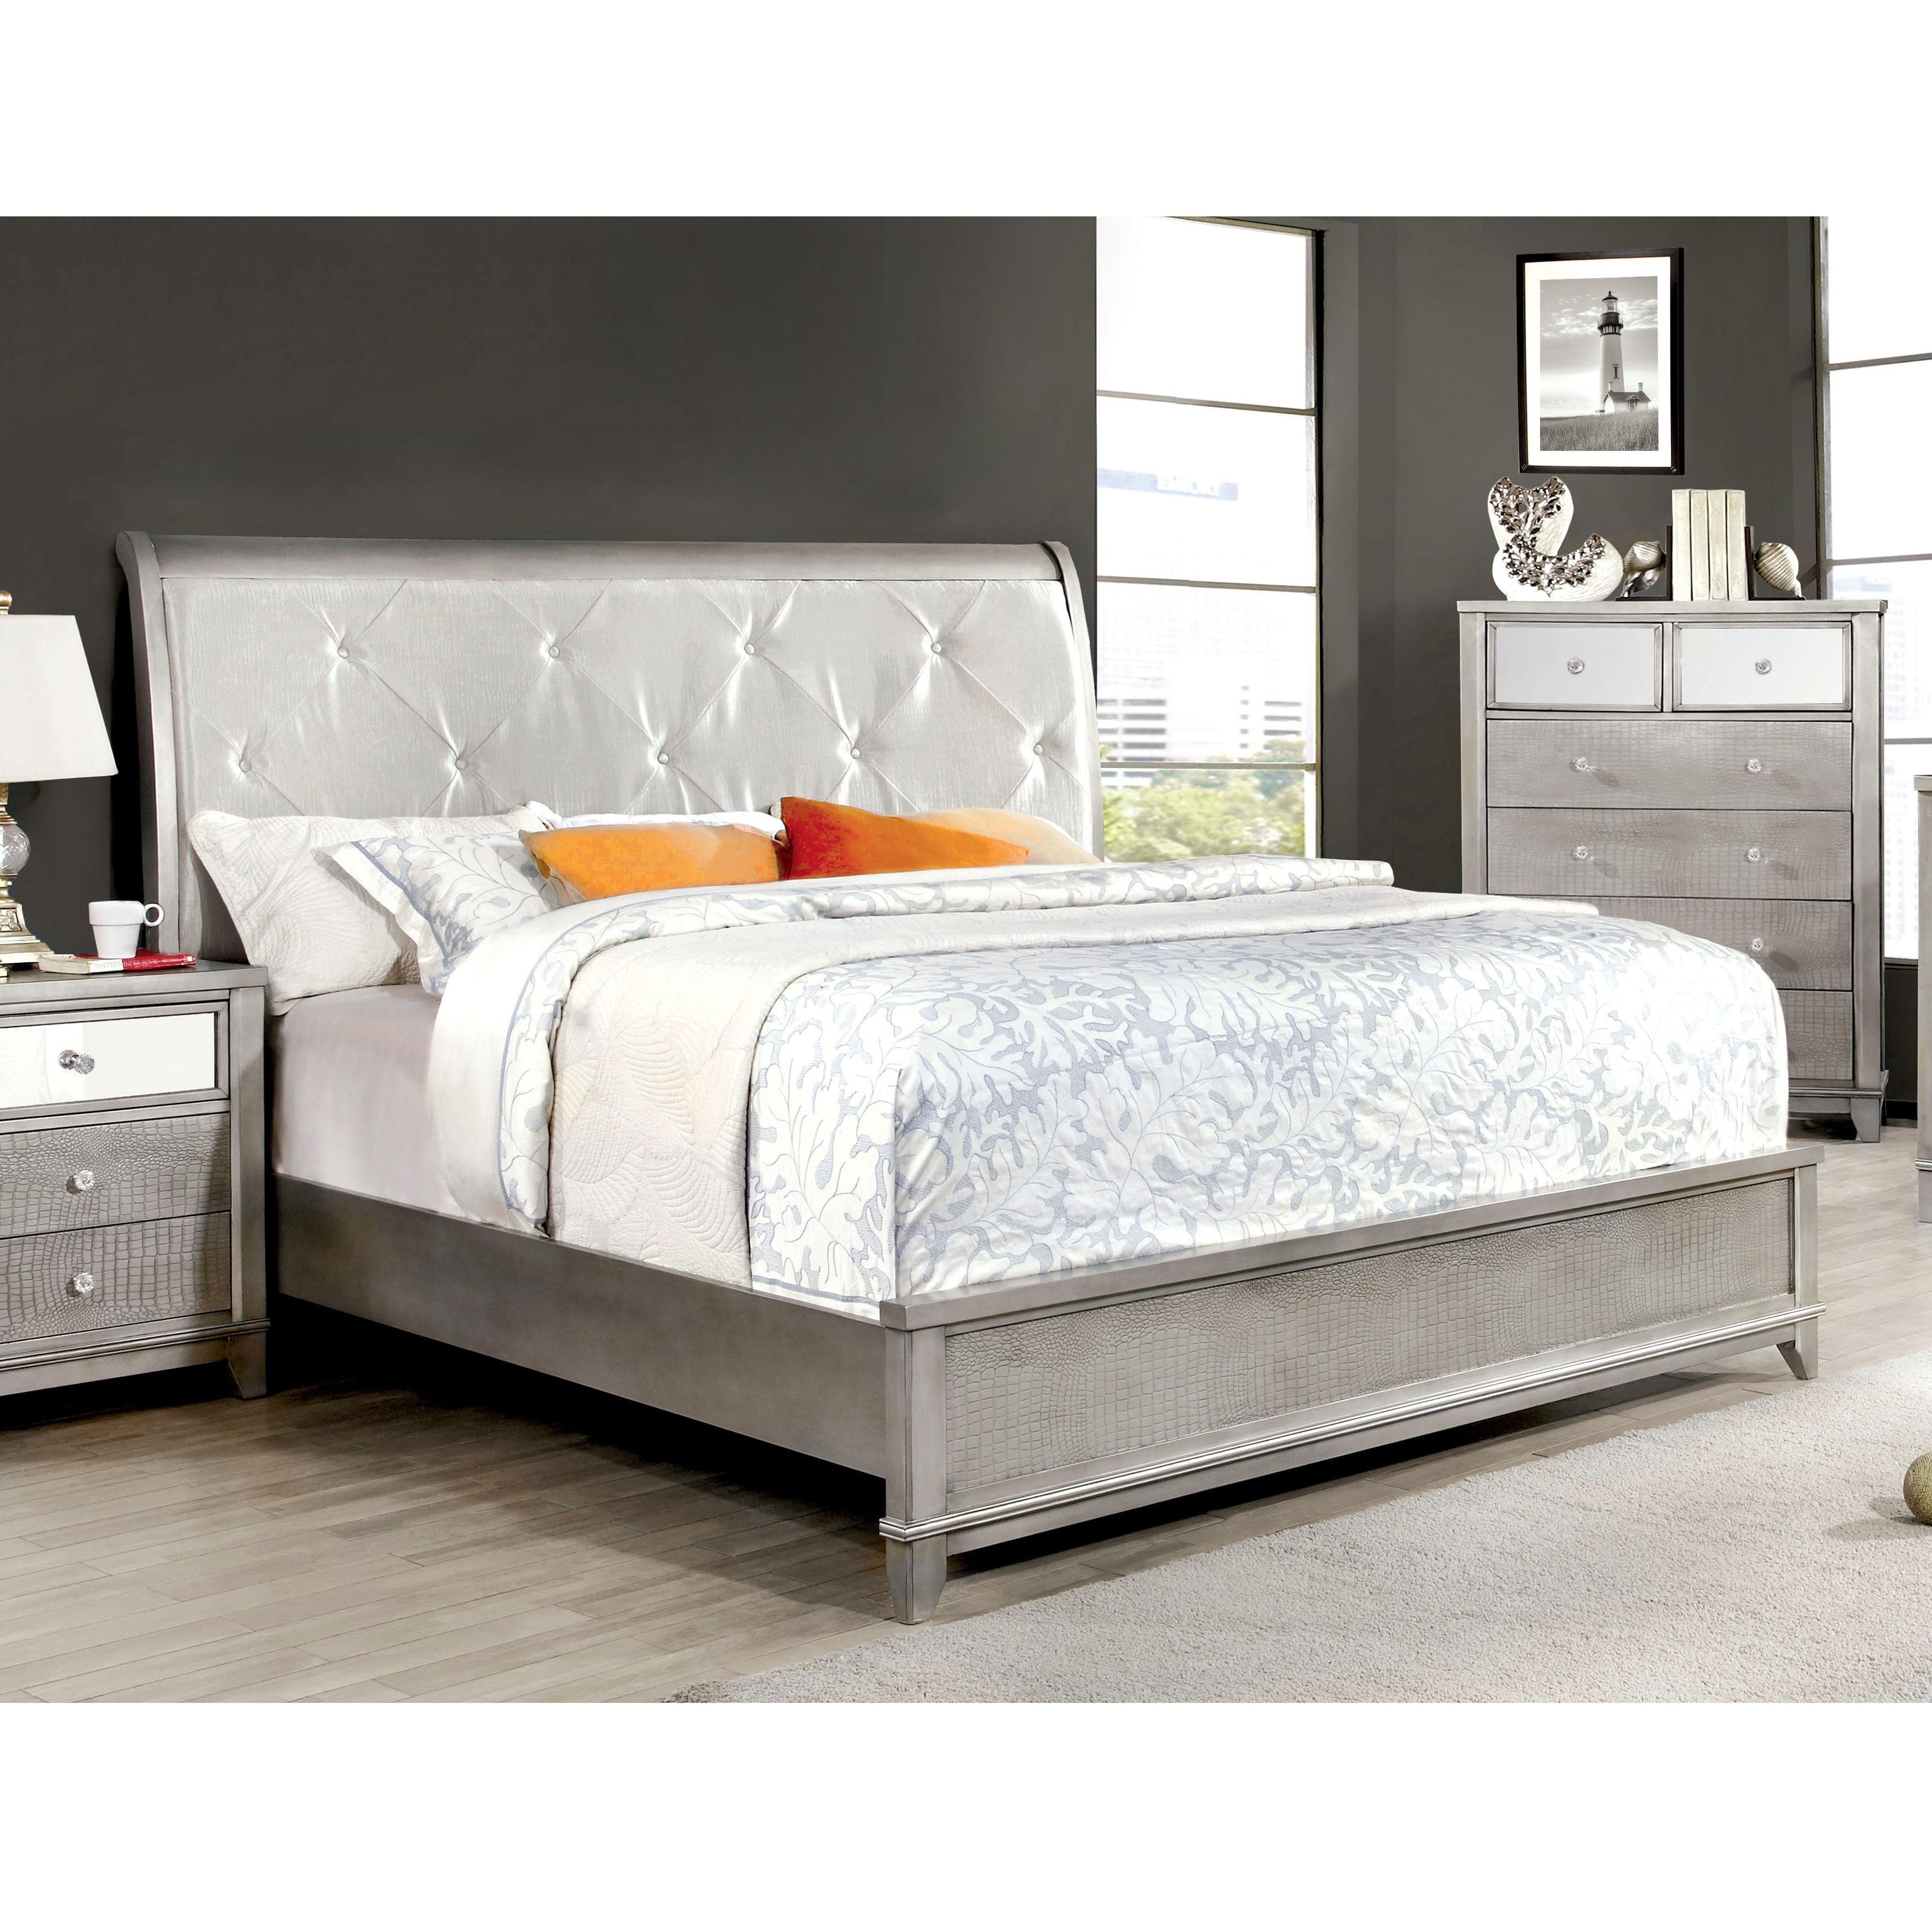 Furniture of America Divonne Modern Crocodile Silver Plat...